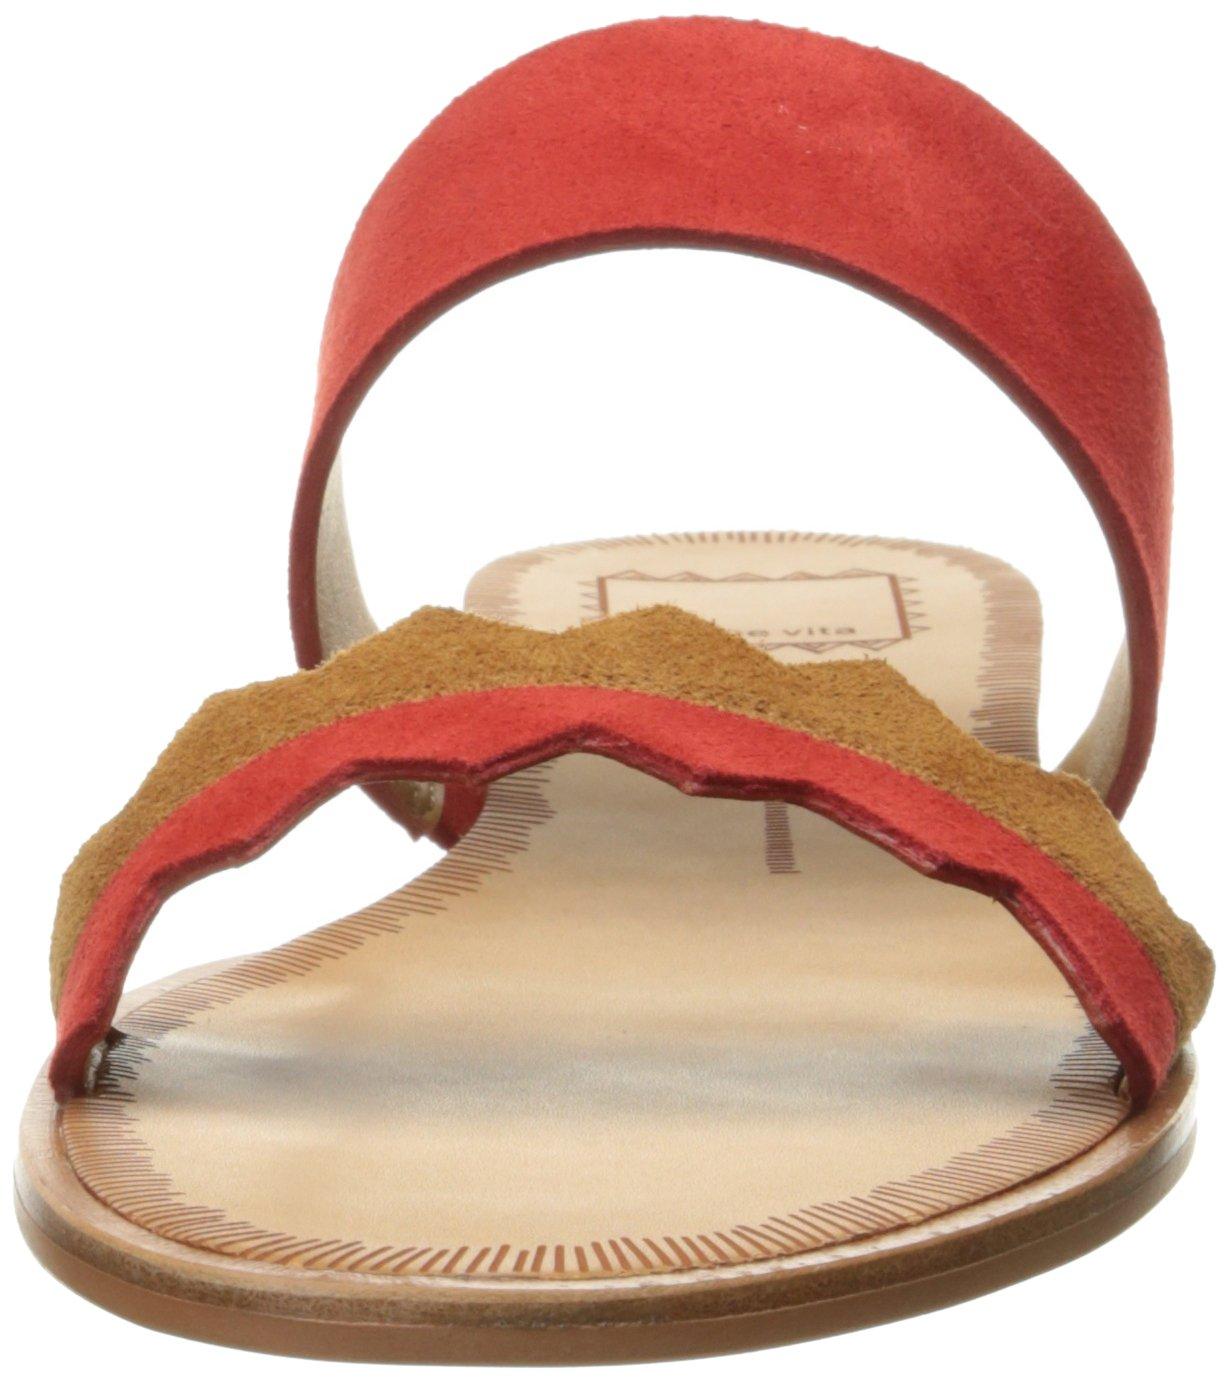 Dolce Vita Women's Pacer Wedge Sandal B01MY765NI 6 B(M) US|Red/Multi Suede